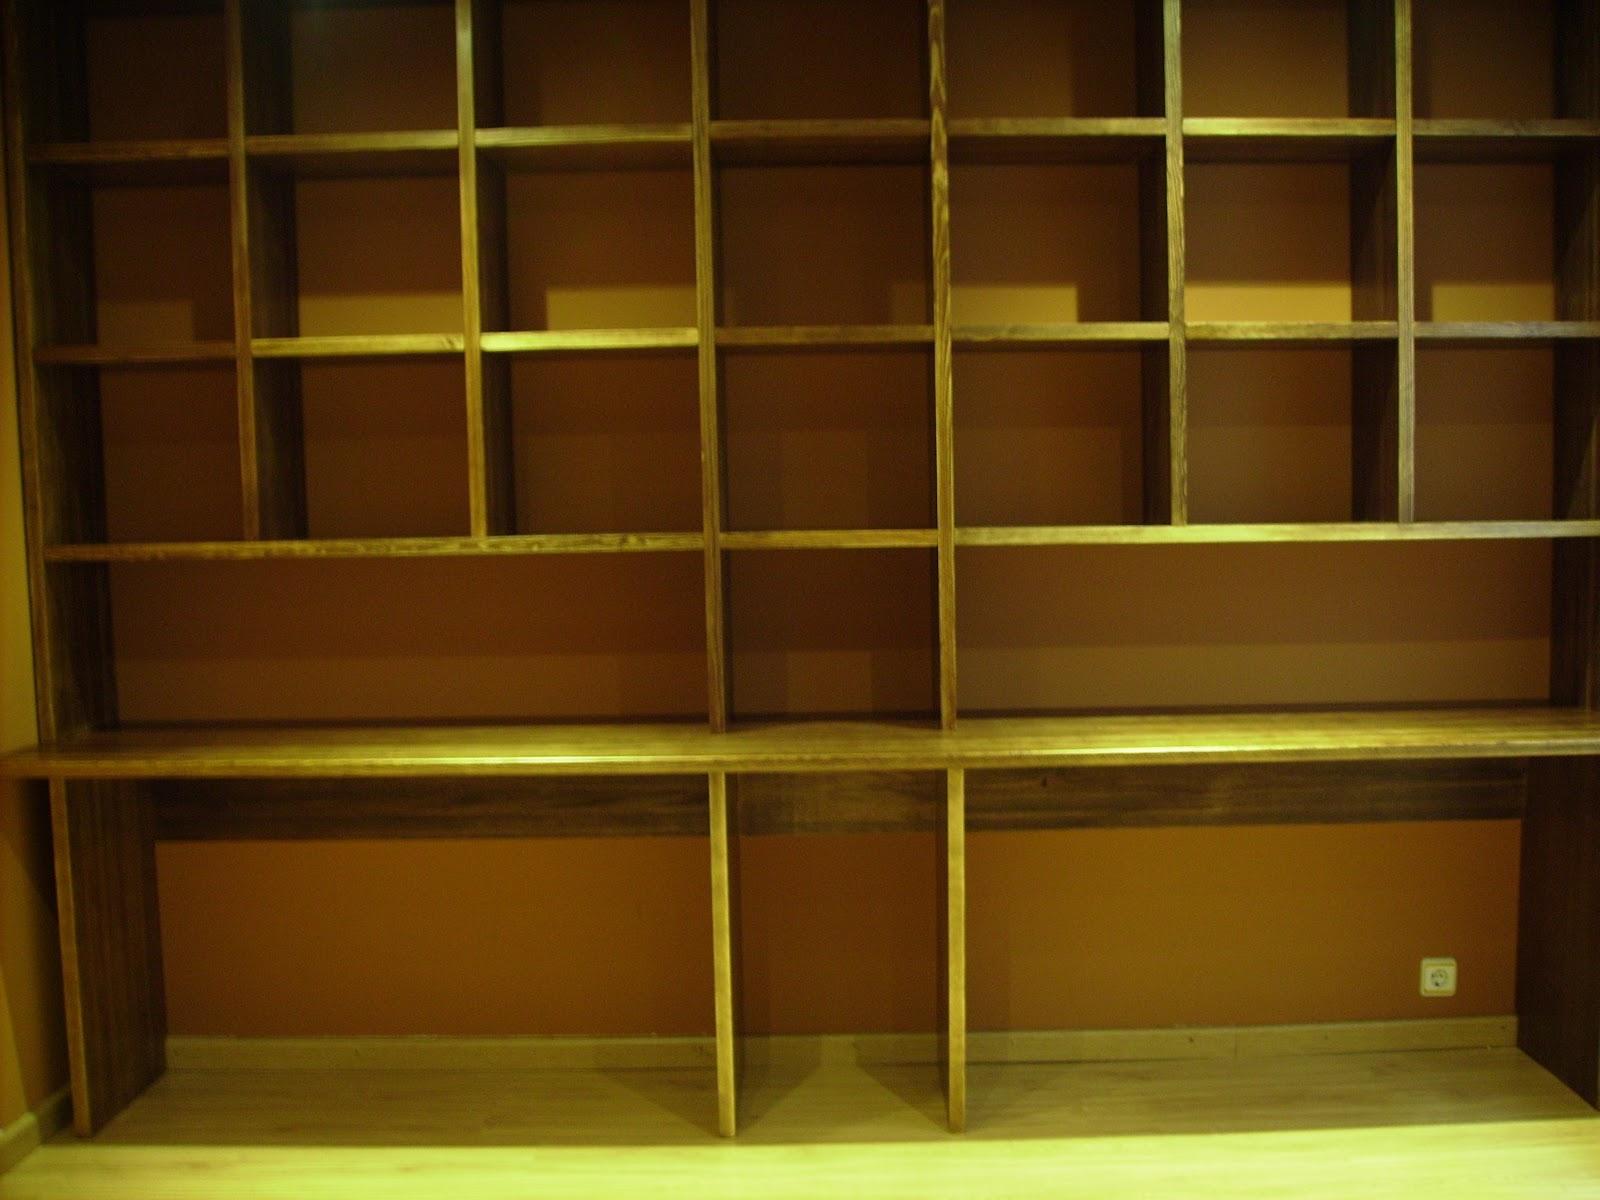 Estanteria de madera maciza - Estanteria madera maciza ...